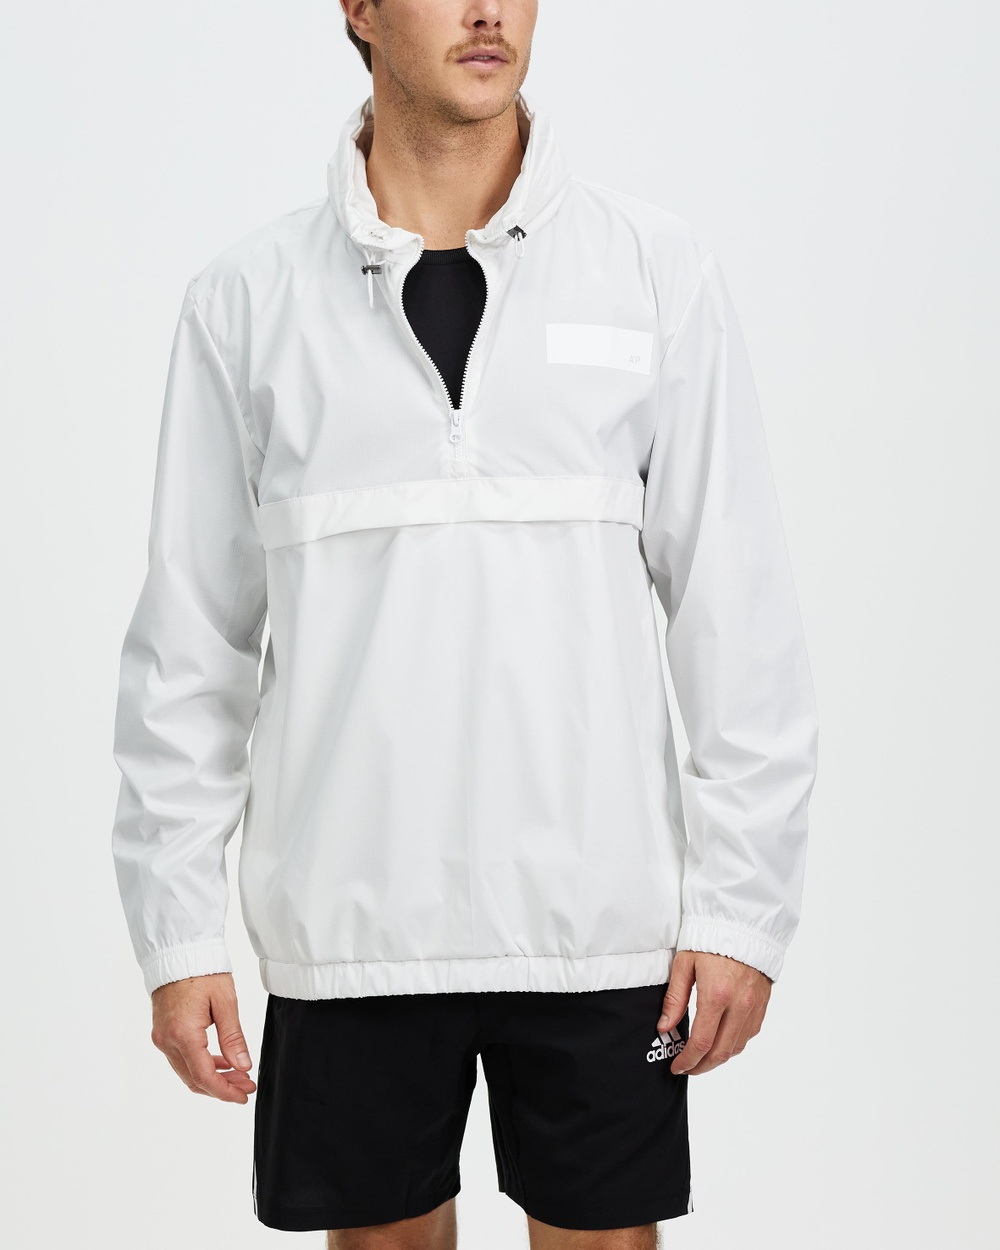 adidas Performance Parley Windbreaker Coats & Jackets White